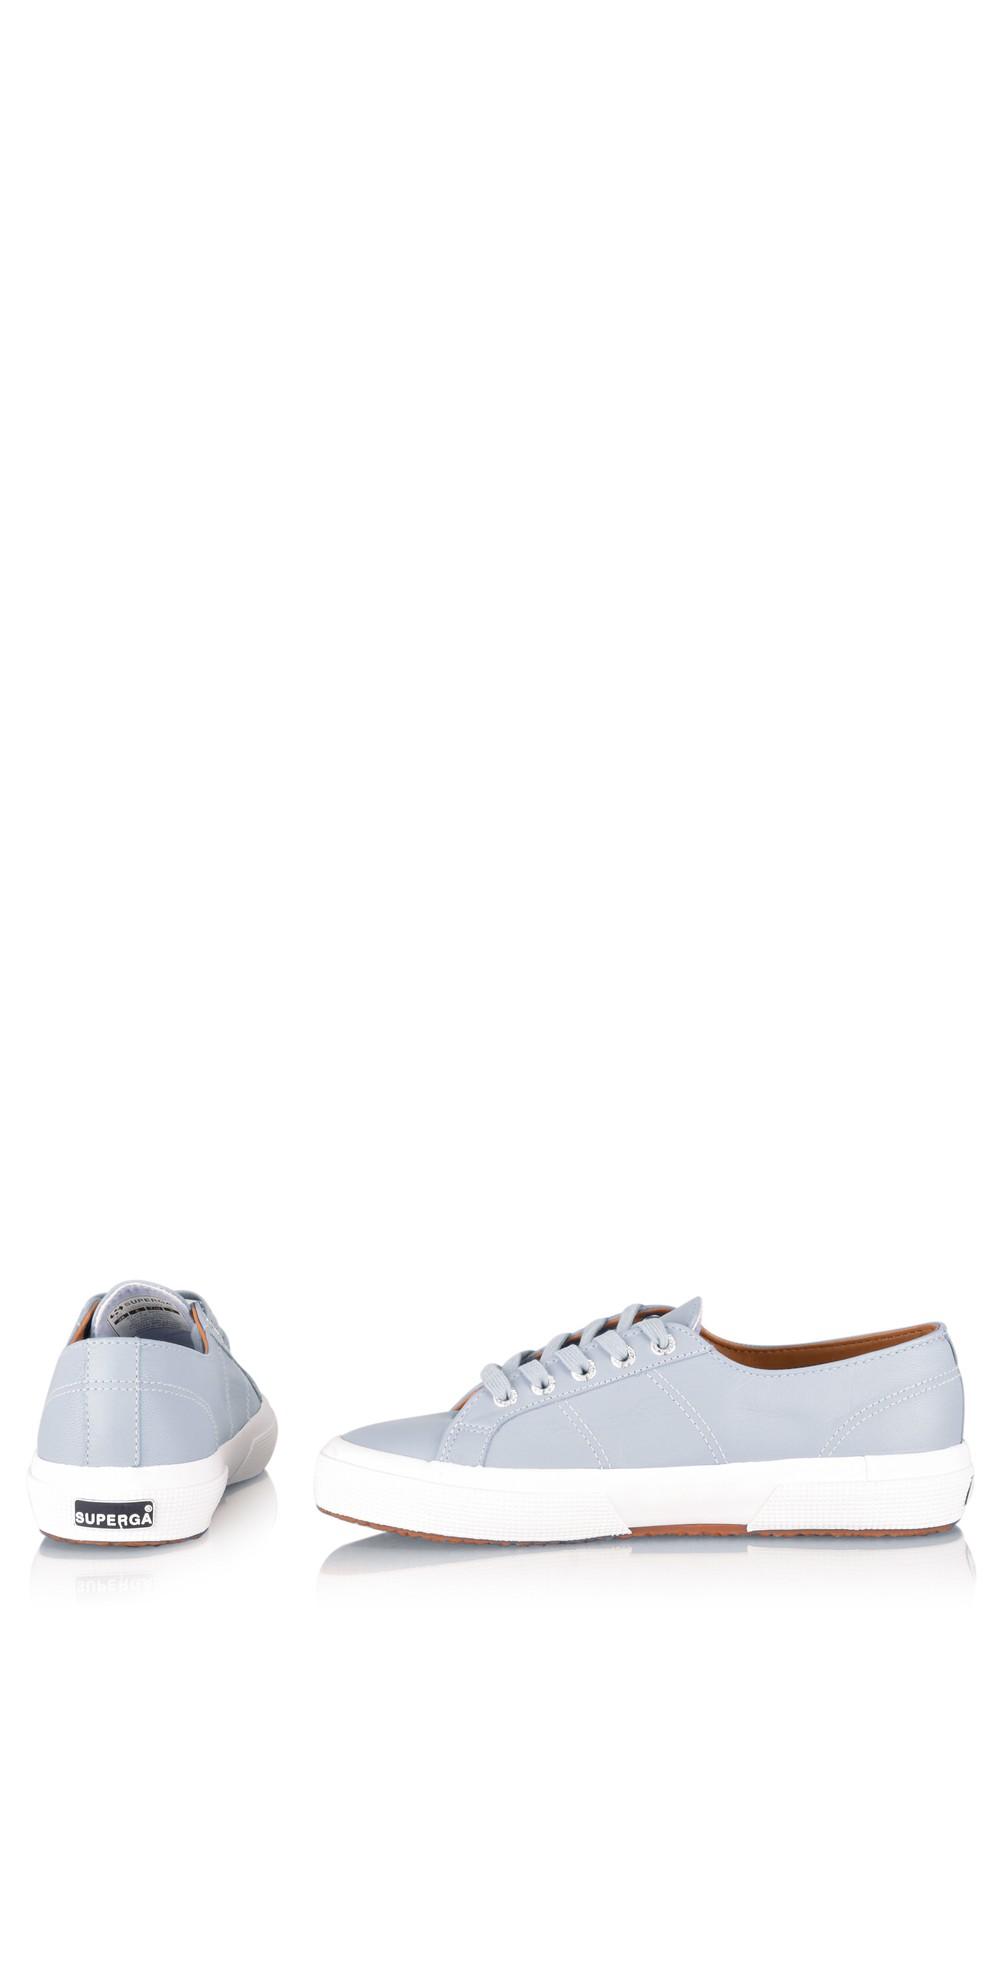 Classic 2750 Cotu Shoe  main image